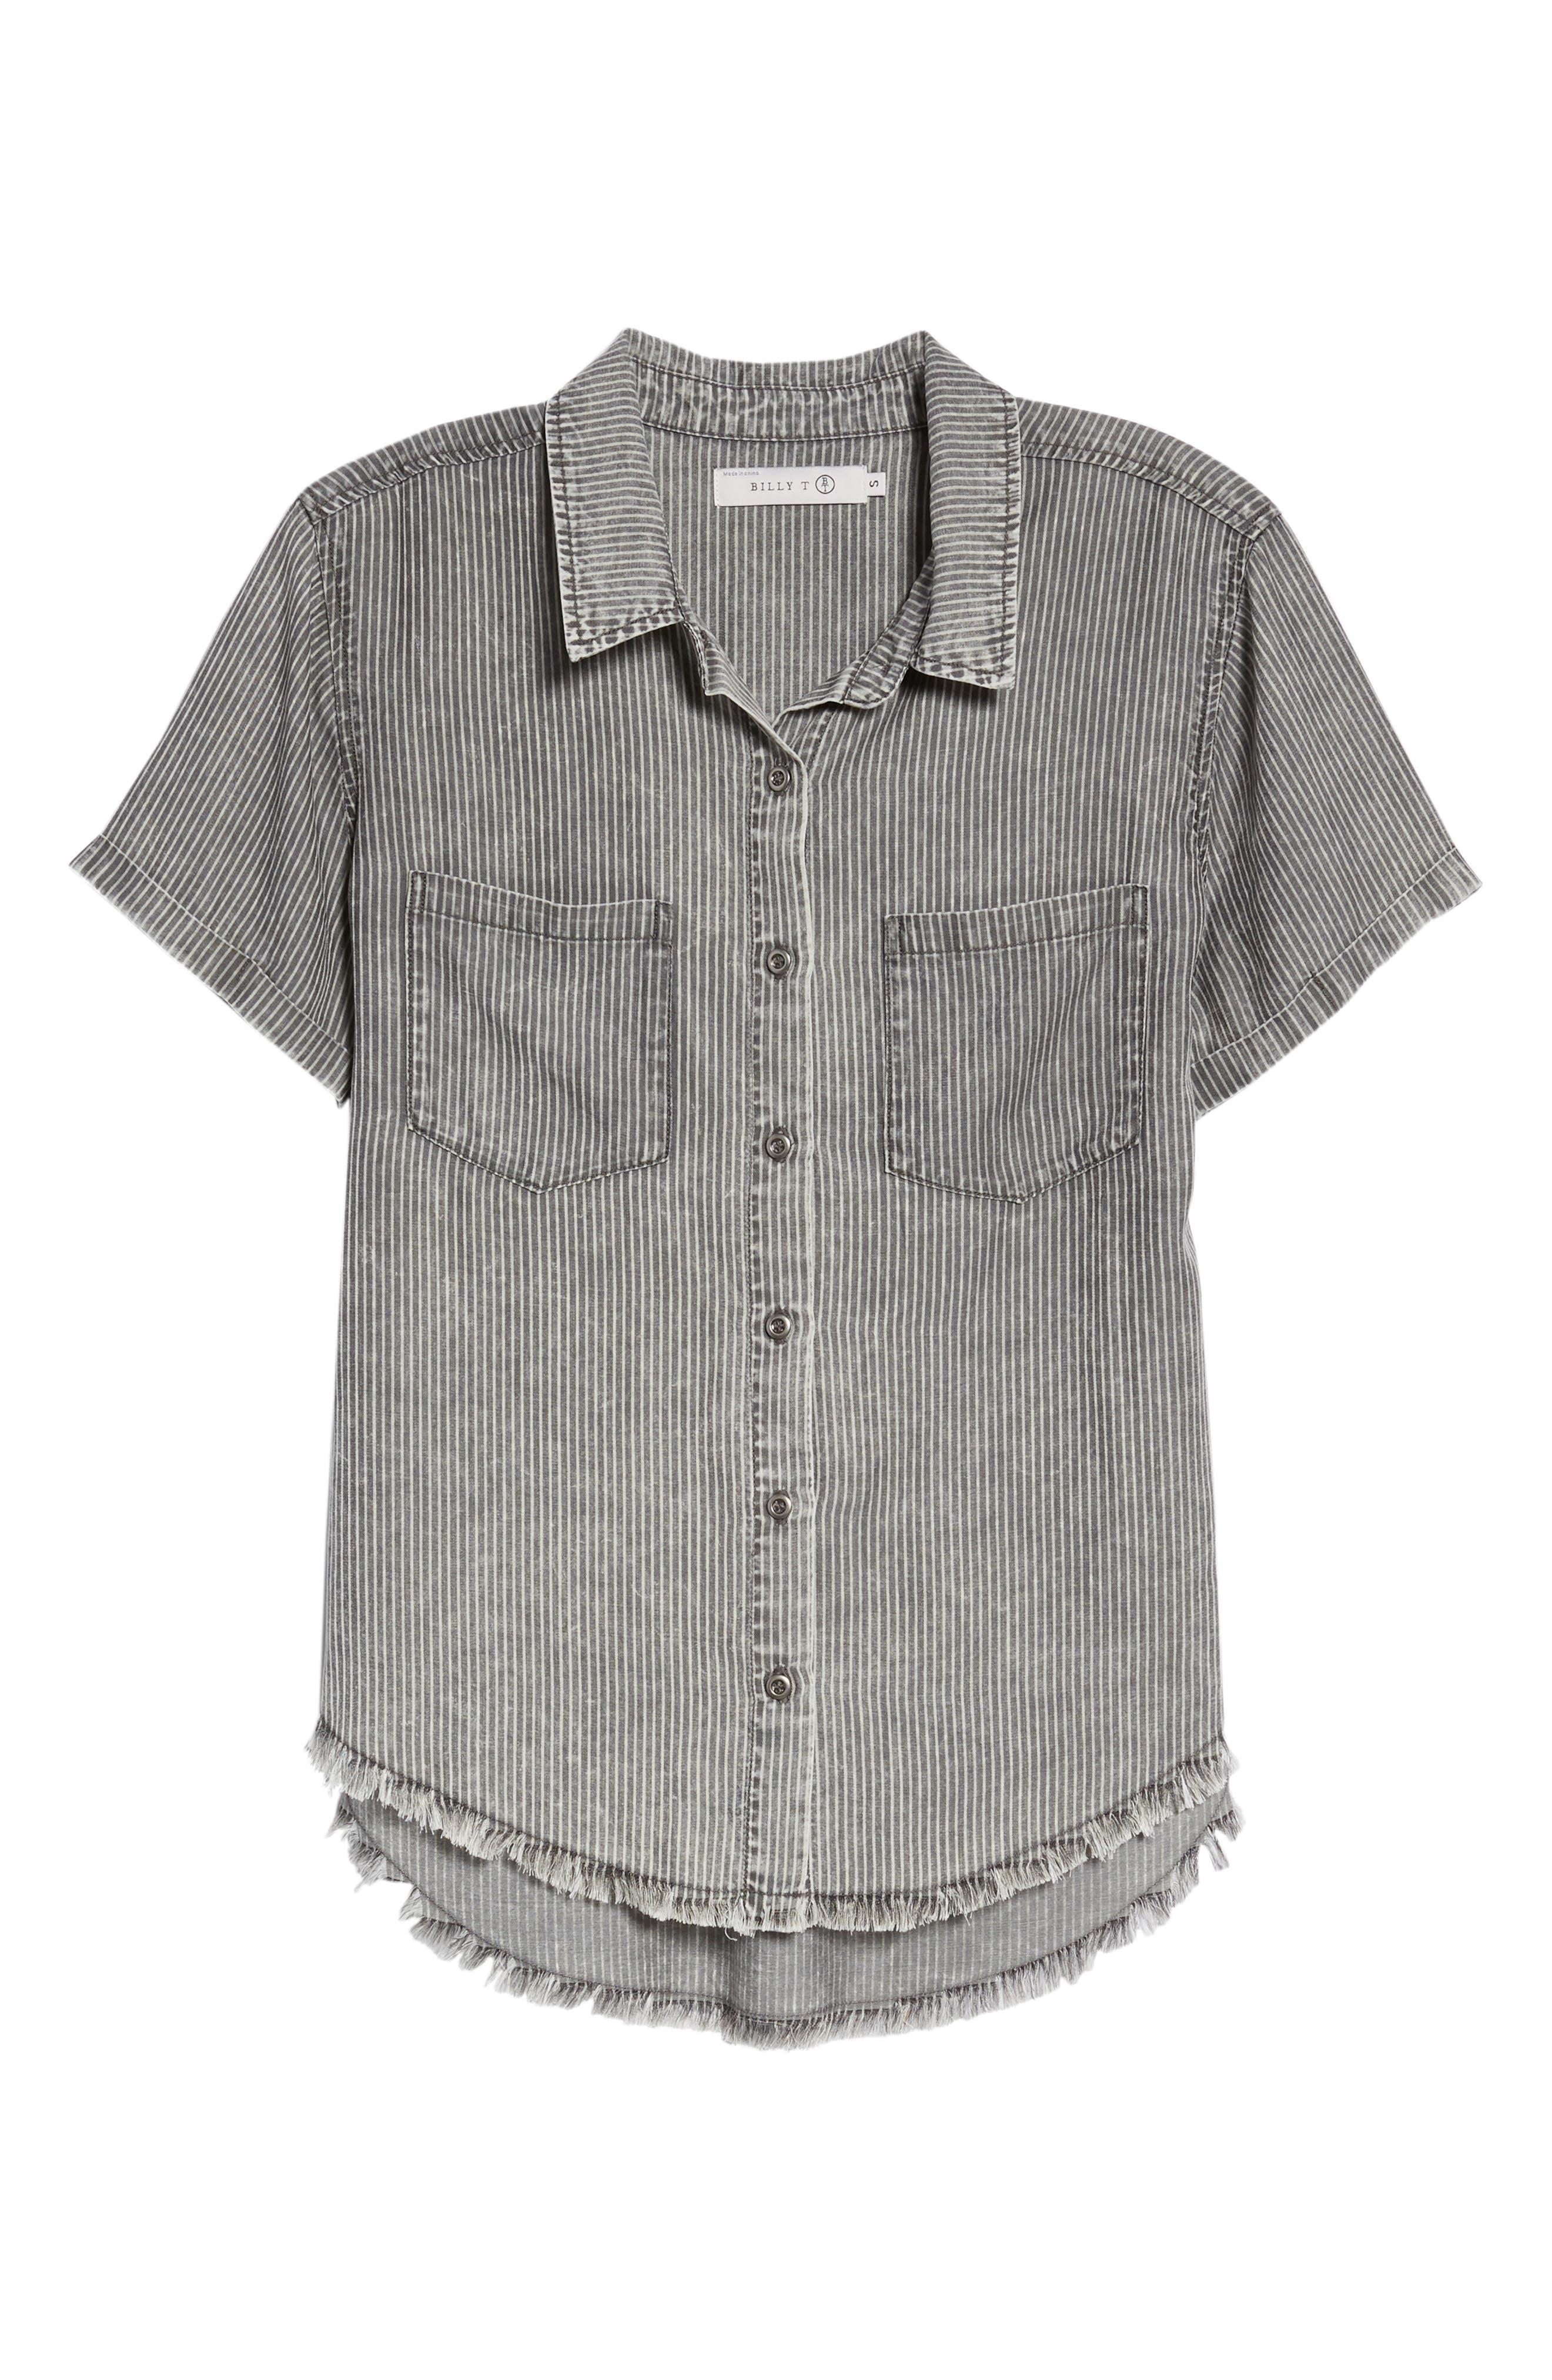 Ticking Stripe Shirt,                             Alternate thumbnail 6, color,                             Grey Rr